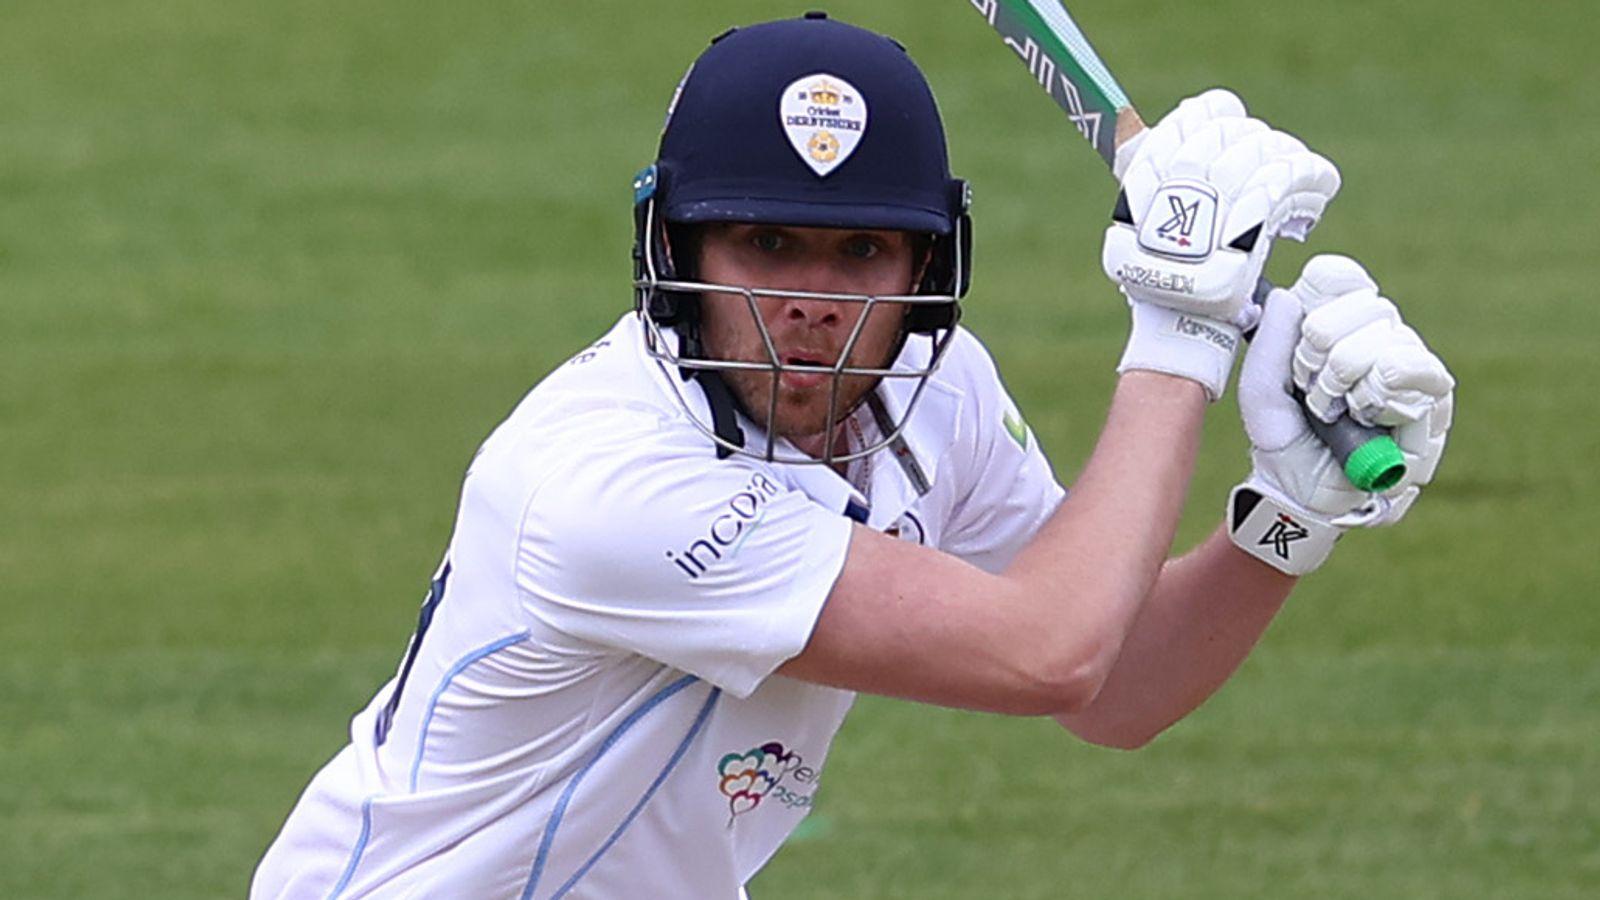 County Championship stats: Matt Critchley breaks Derbyshire record; Simon Harmer stars again for Essex